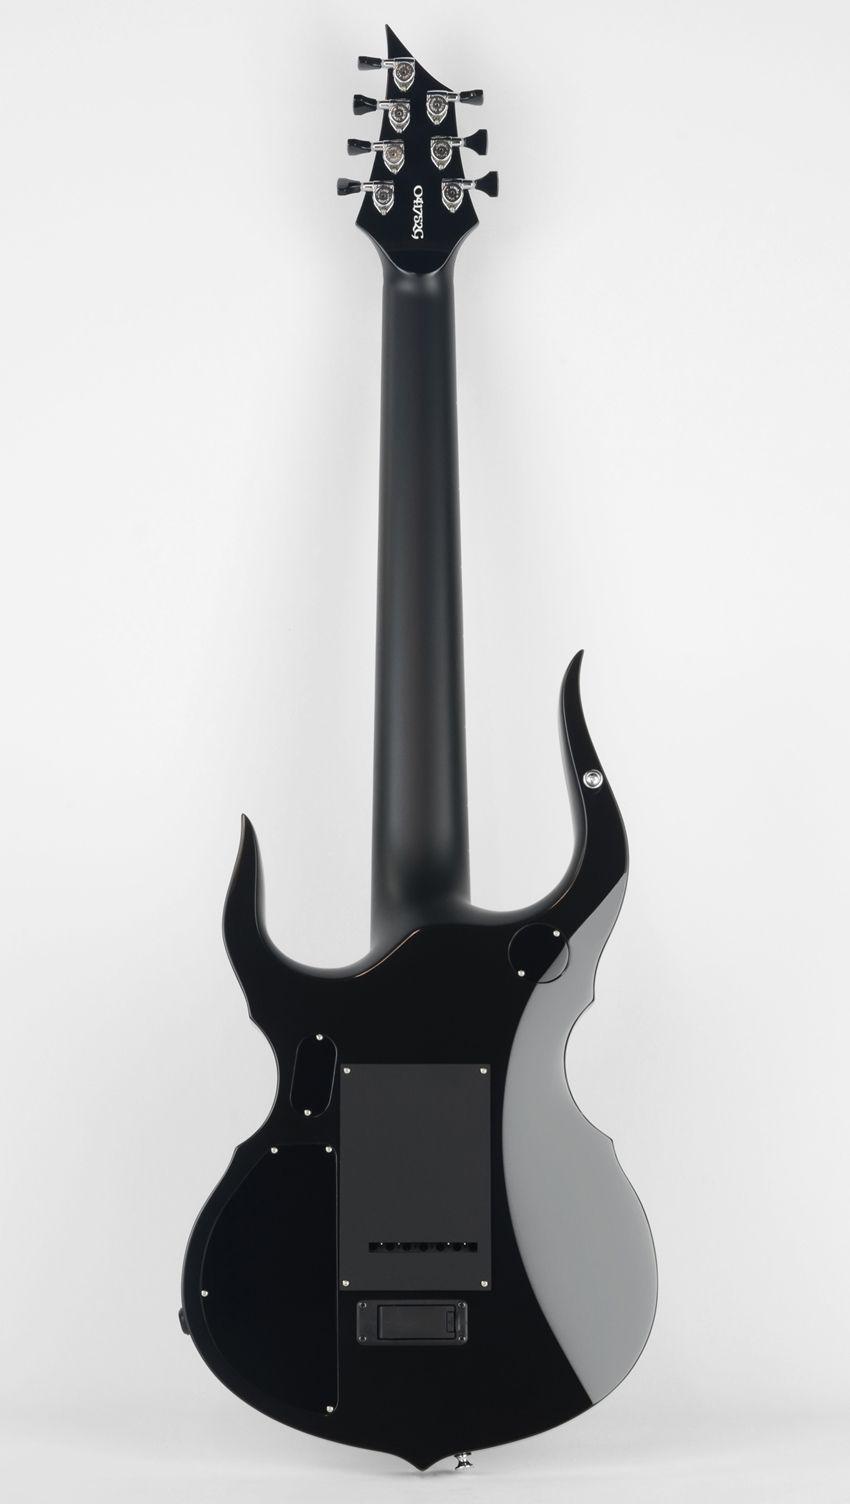 Arda Guitars Chitarra Elettrica Di Liuteria Italiana Handmade